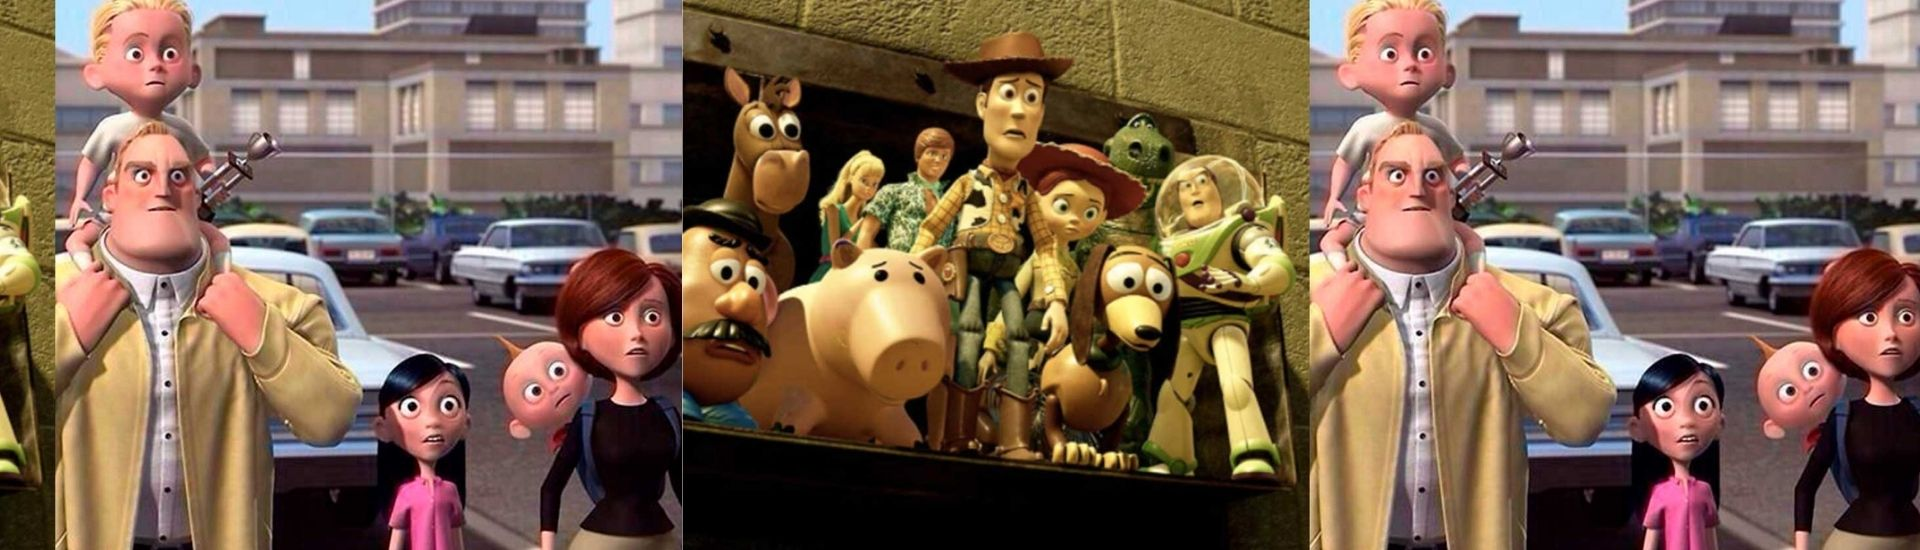 Portadas de películas: Toy Story e Increíbles